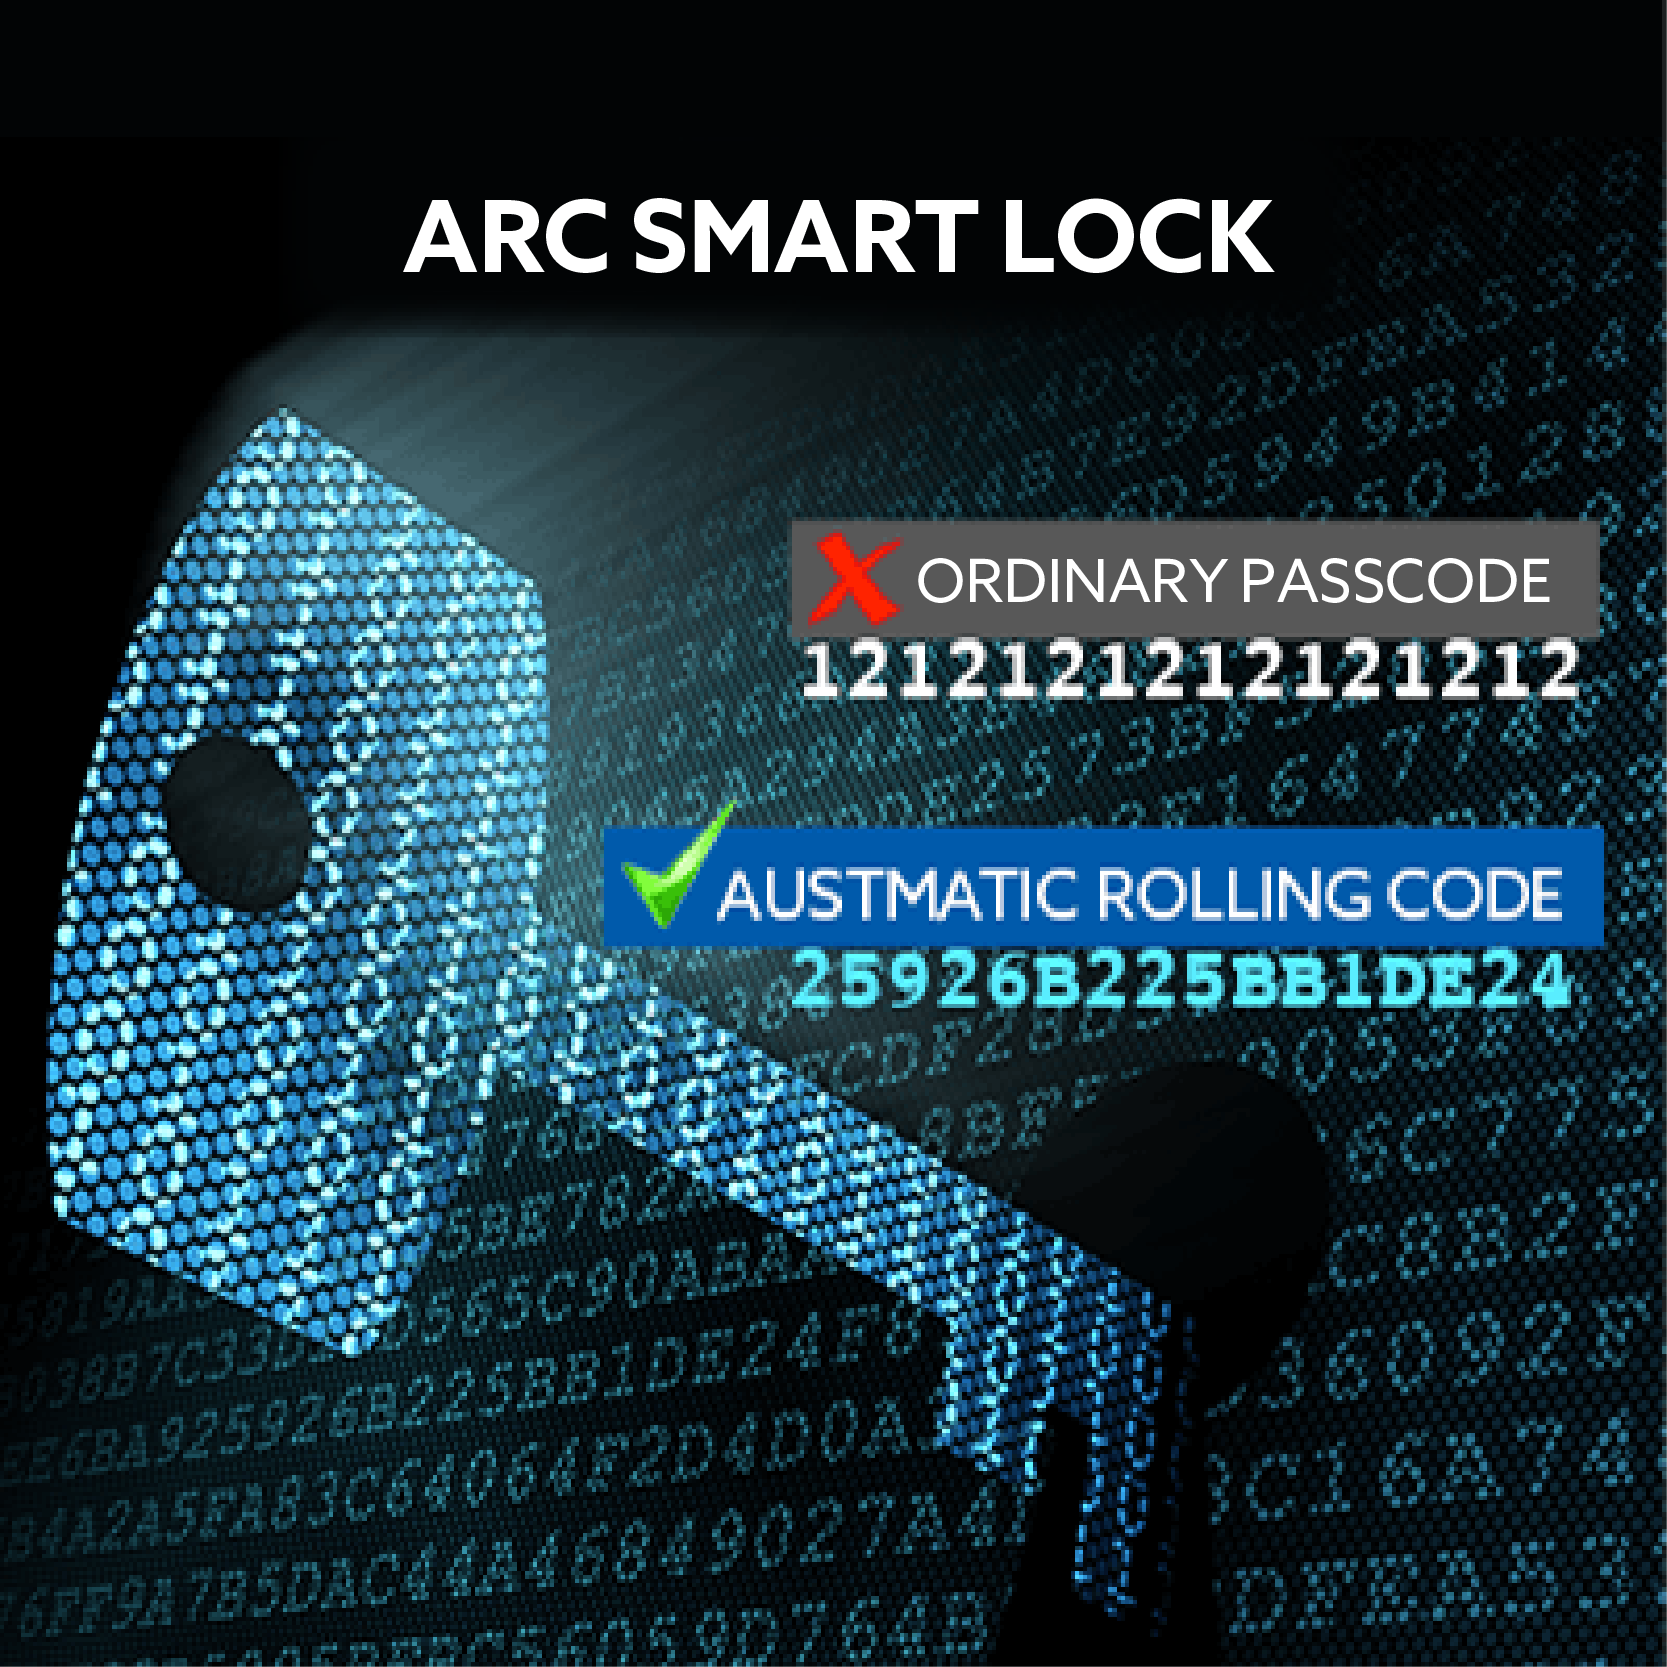 ARC SMART LOCK